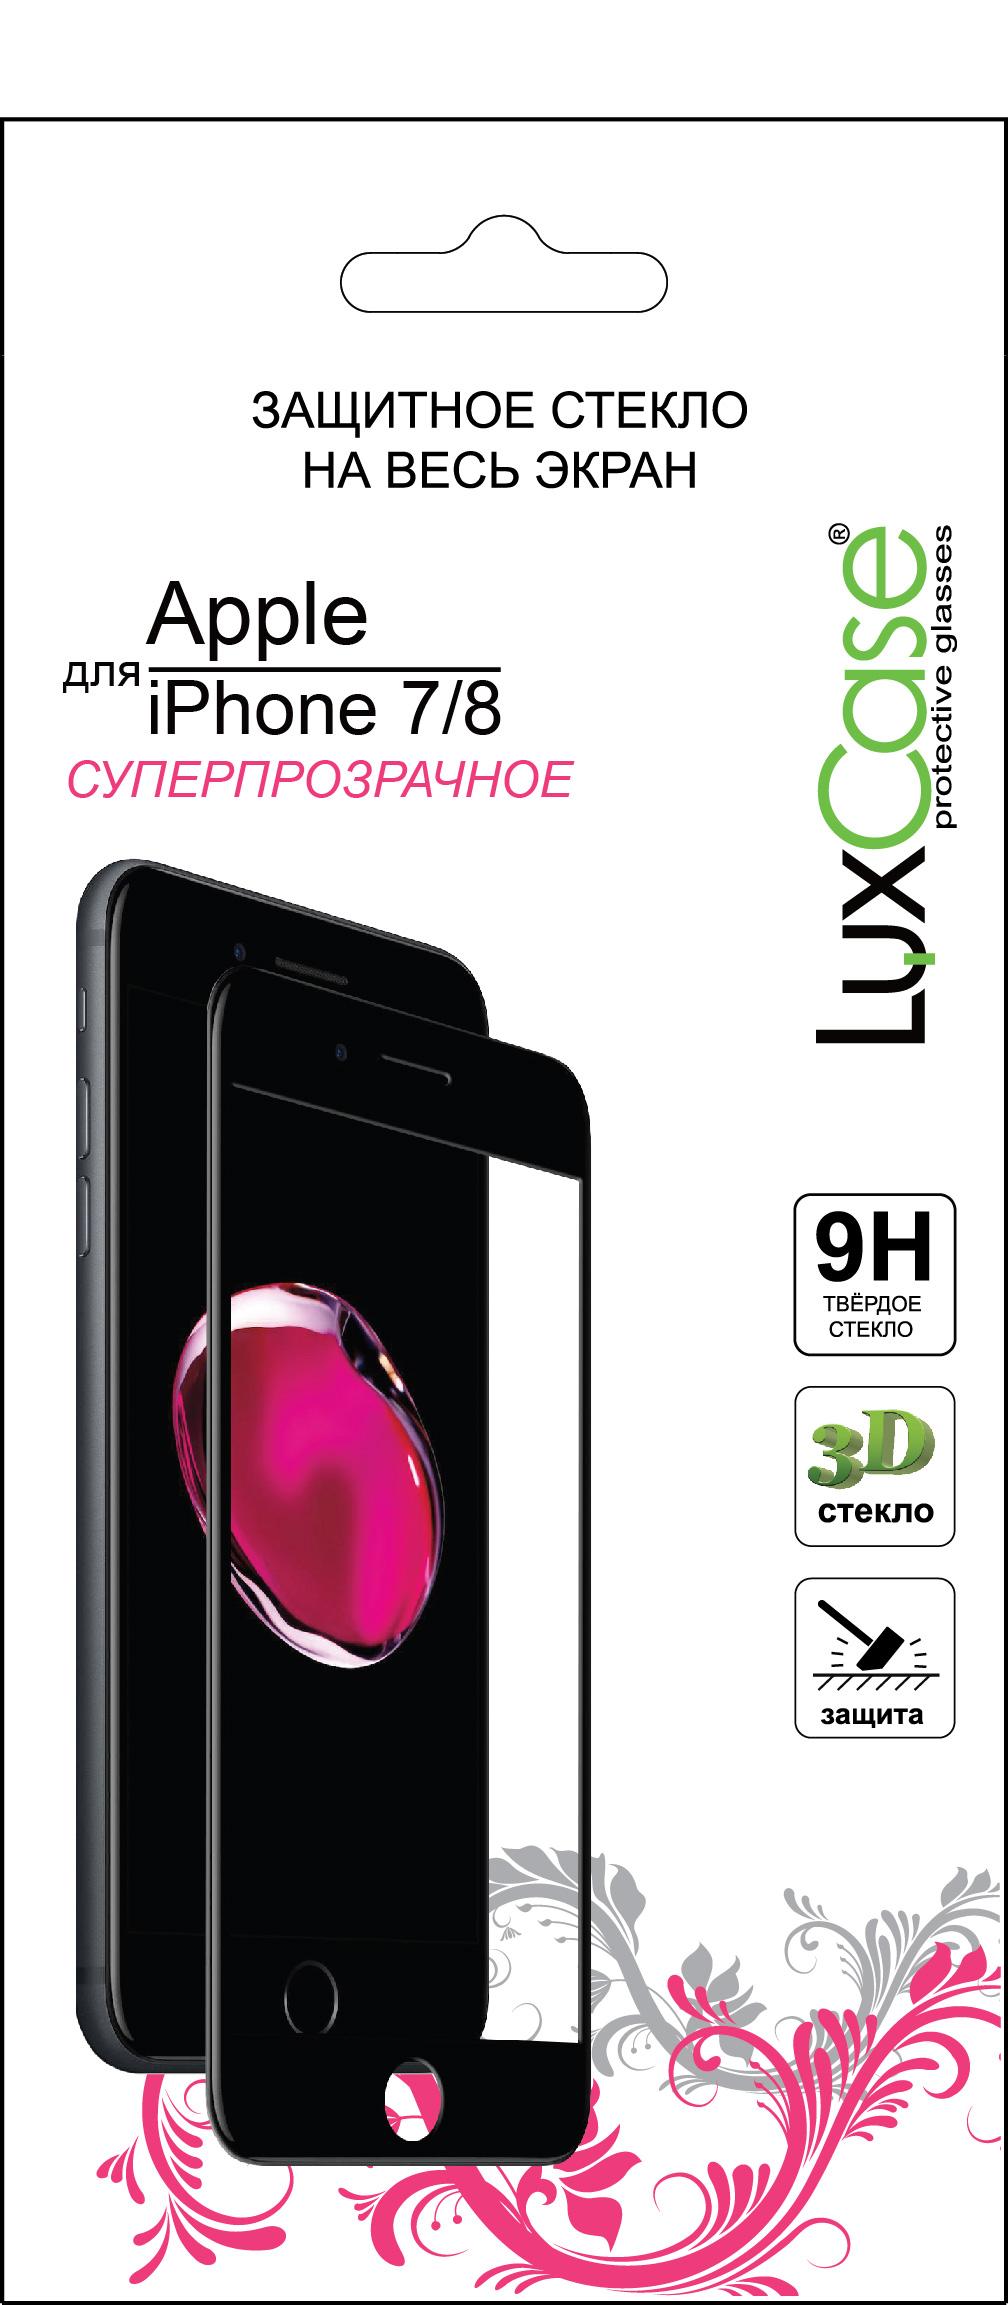 LuxCase защитное стекло 2,5D для Apple iPhone 7/8, Black